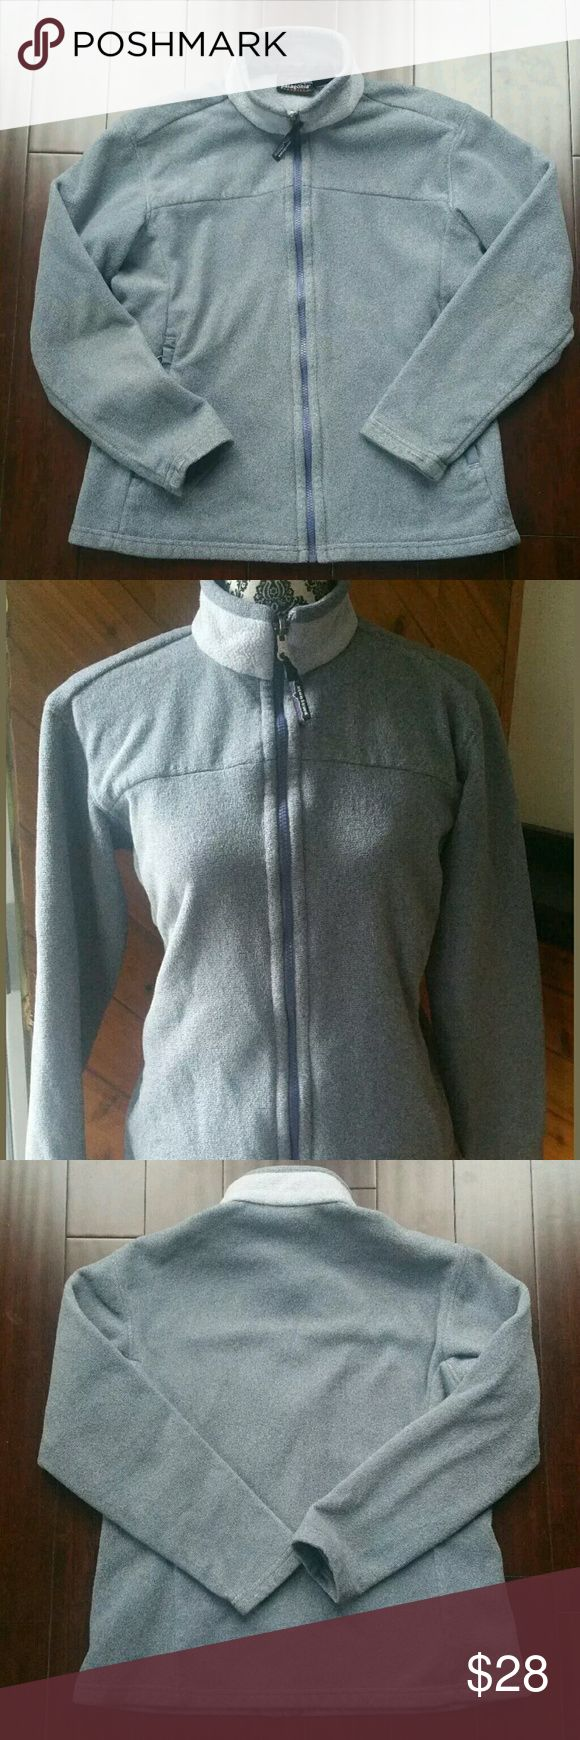 Patagonia fleece jacket Patagonia zip up fleece Size medium Good condition Patagonia Jackets & Coats